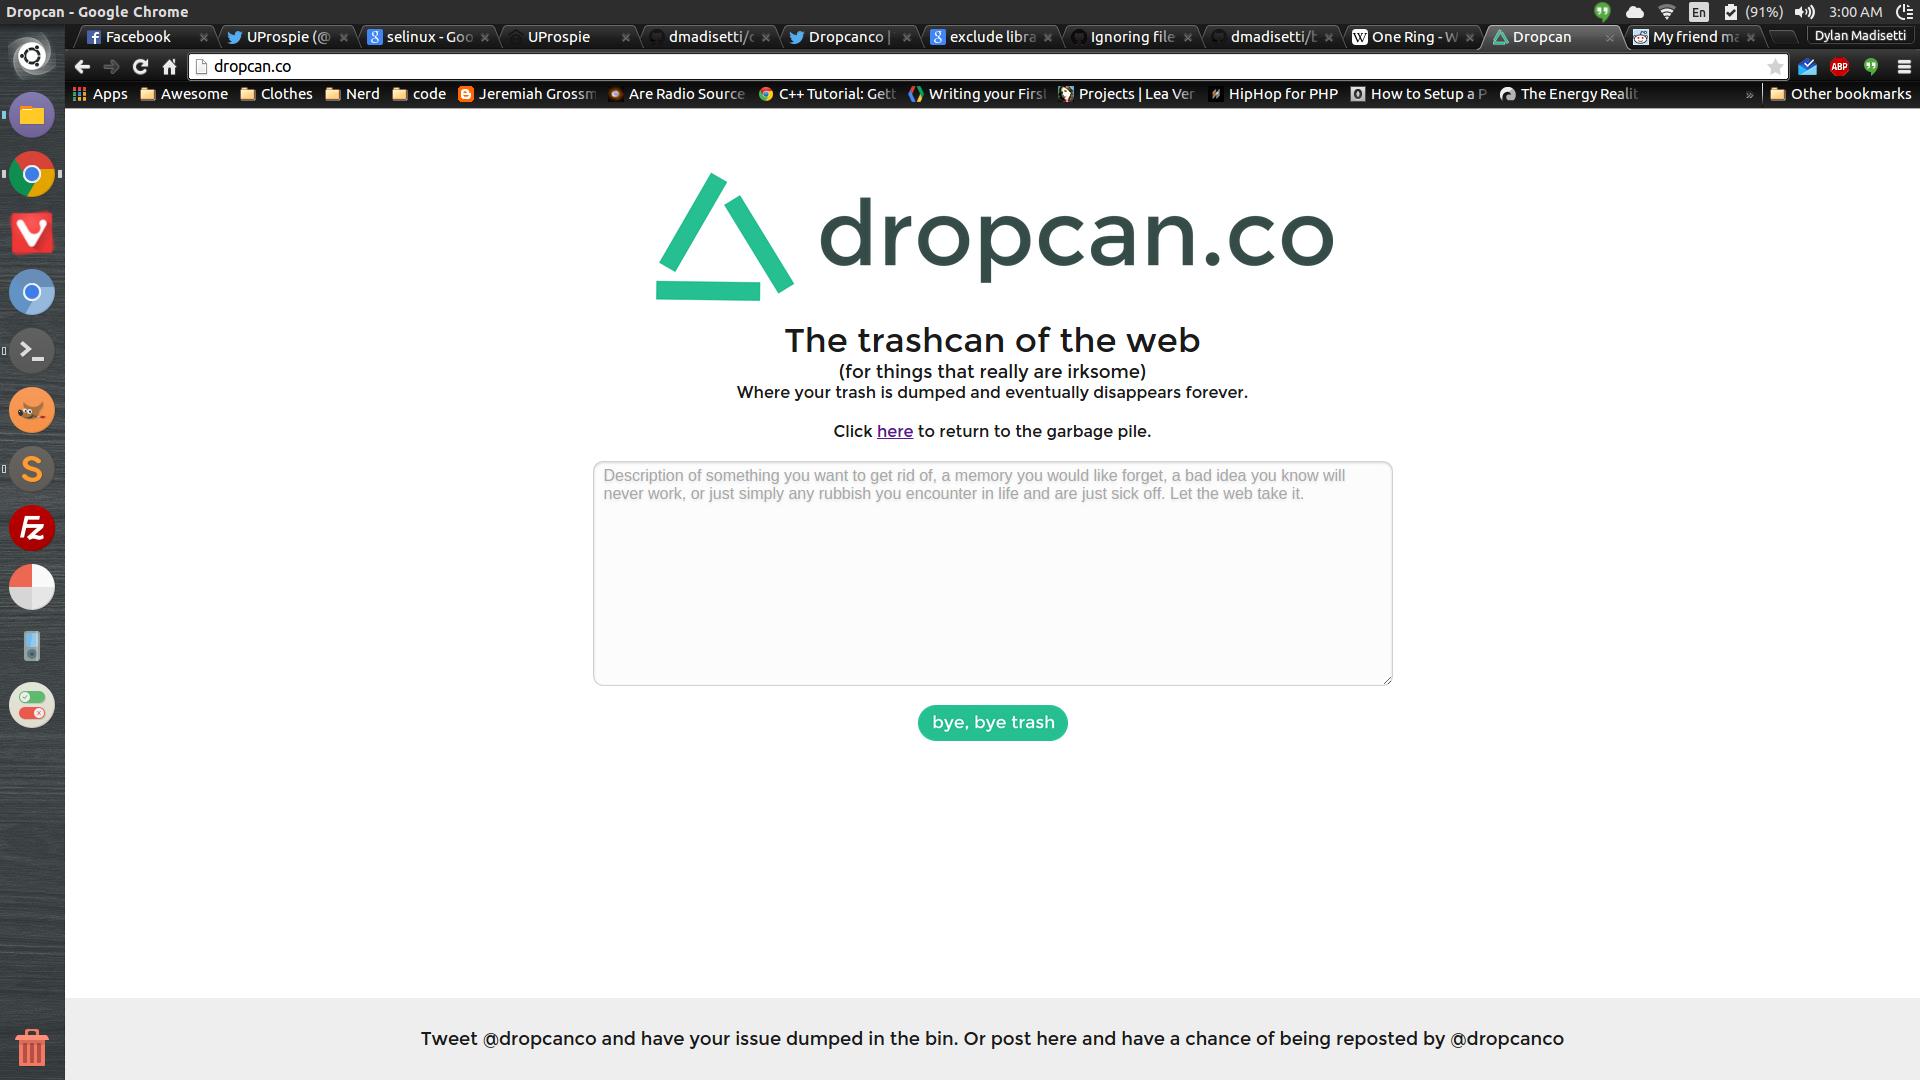 What Dropcanco looks like